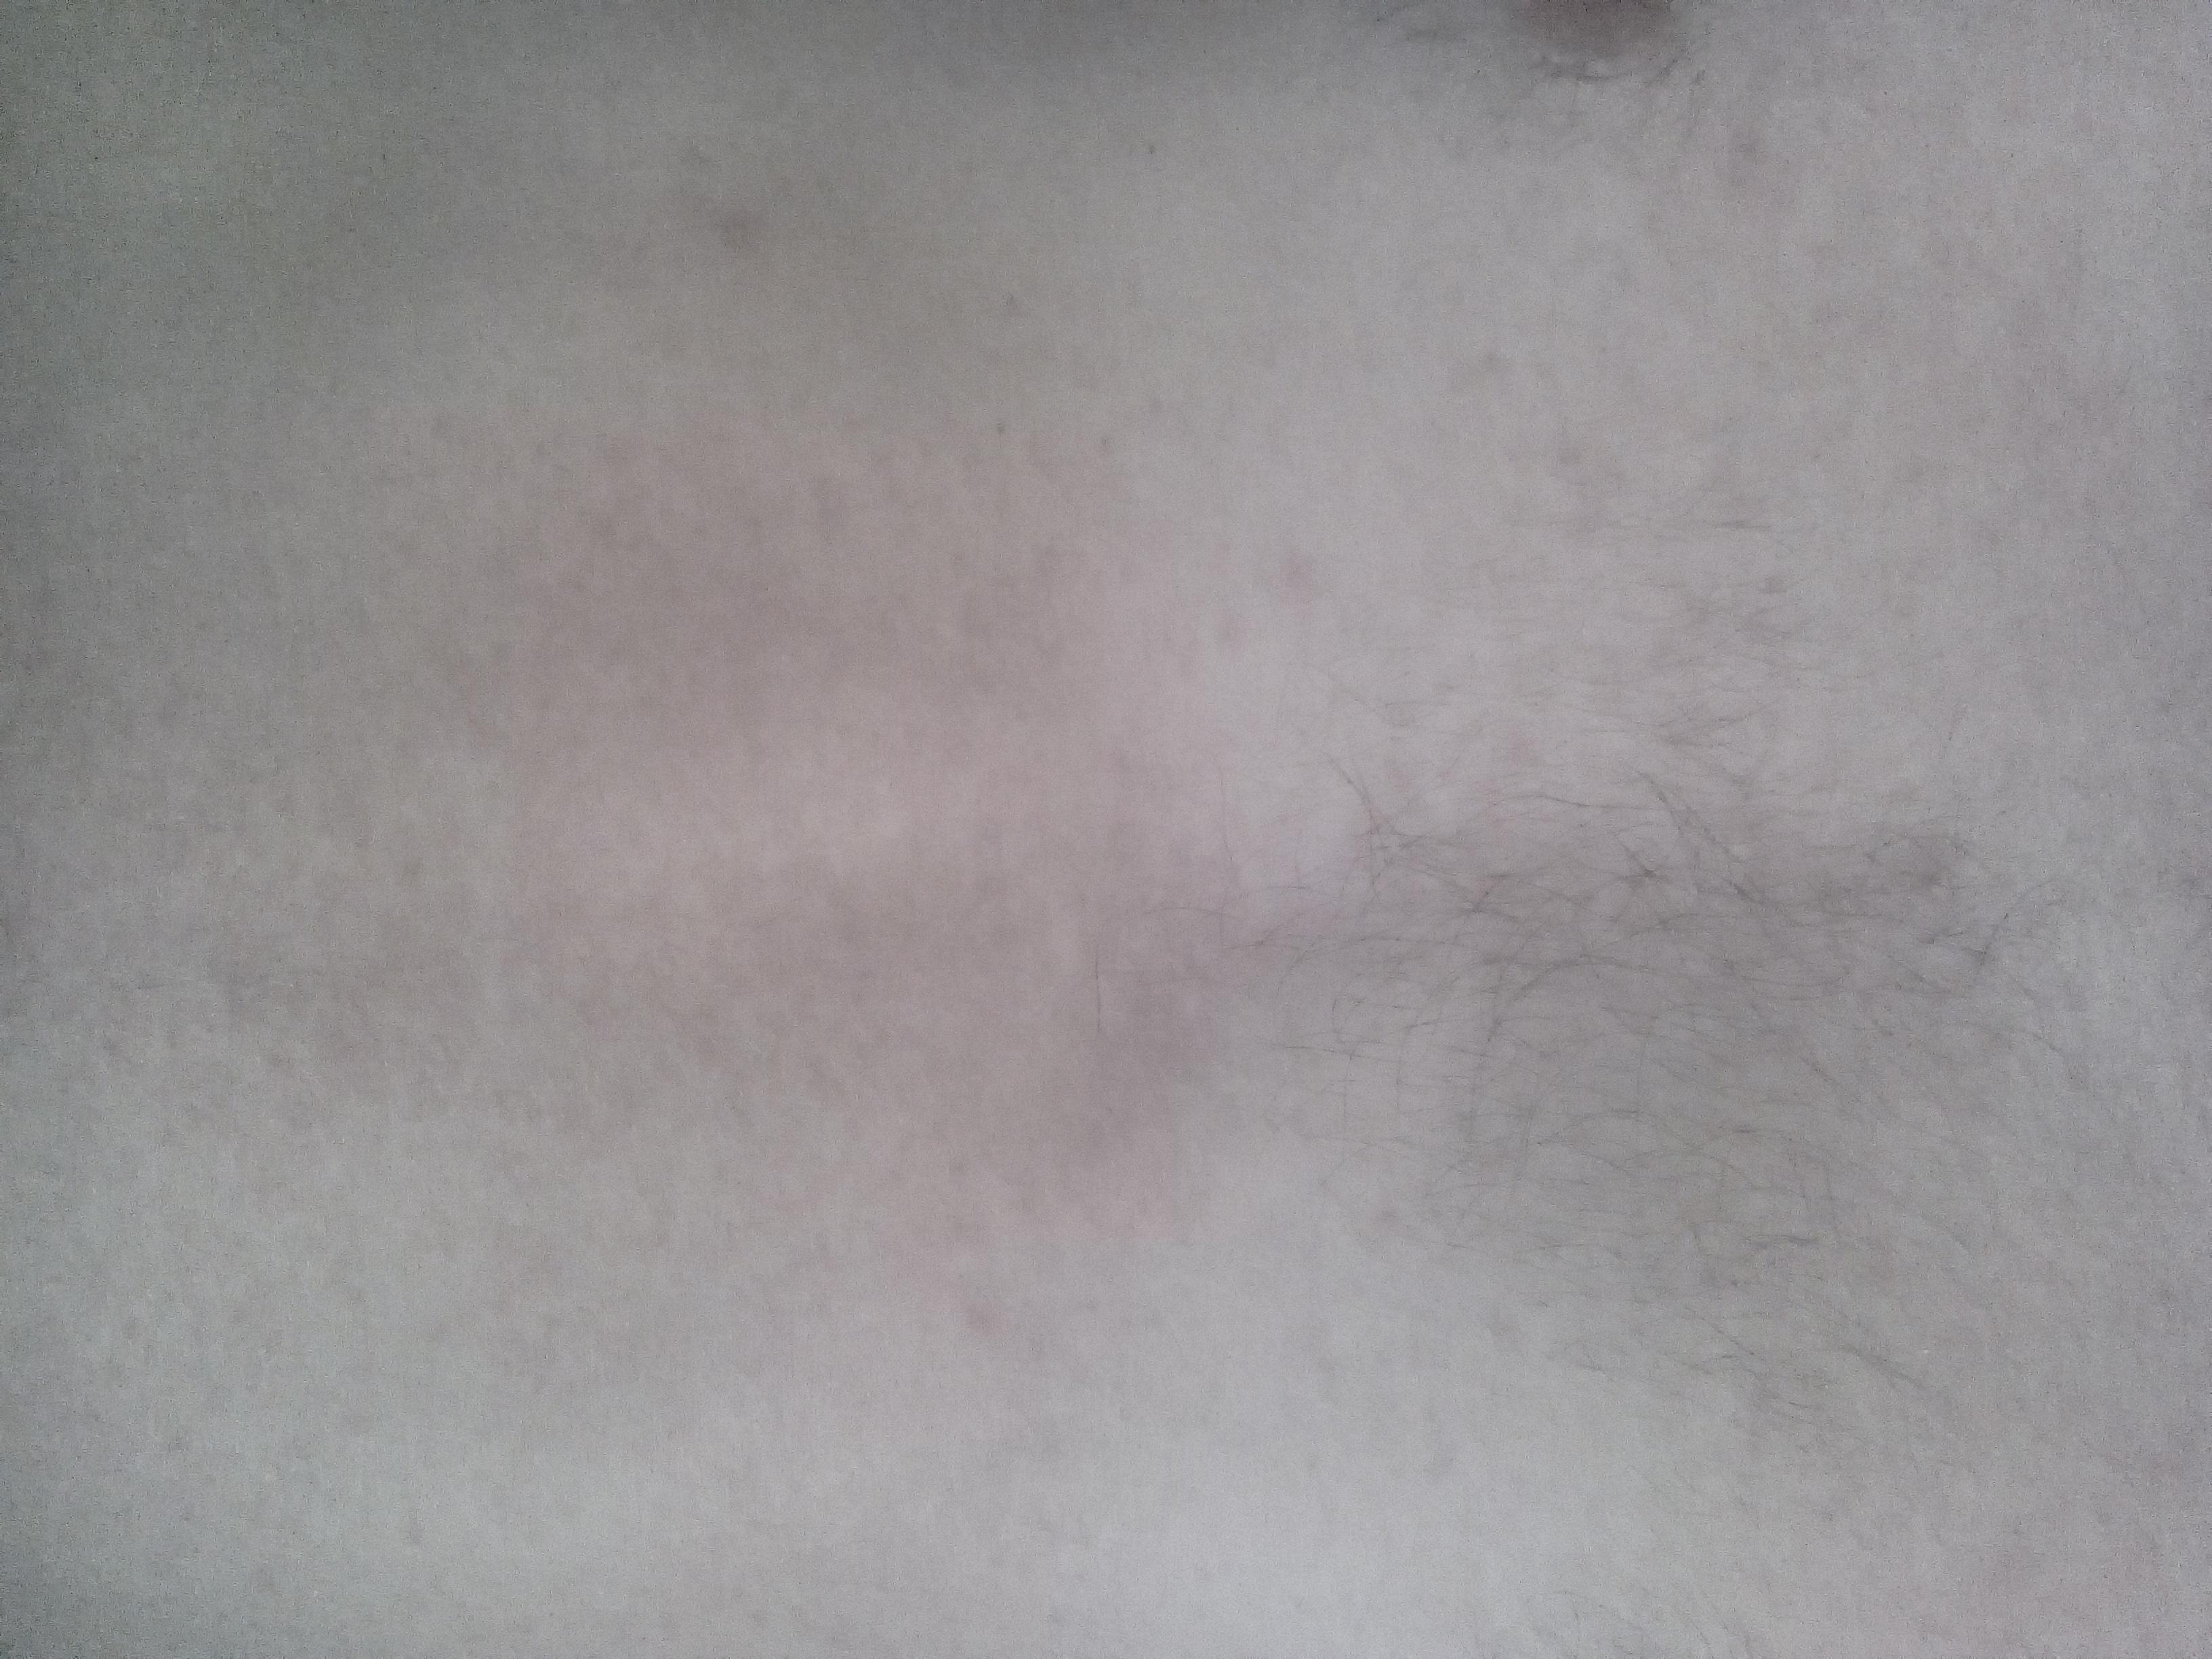 телеангиэктатические пятна на лице фото